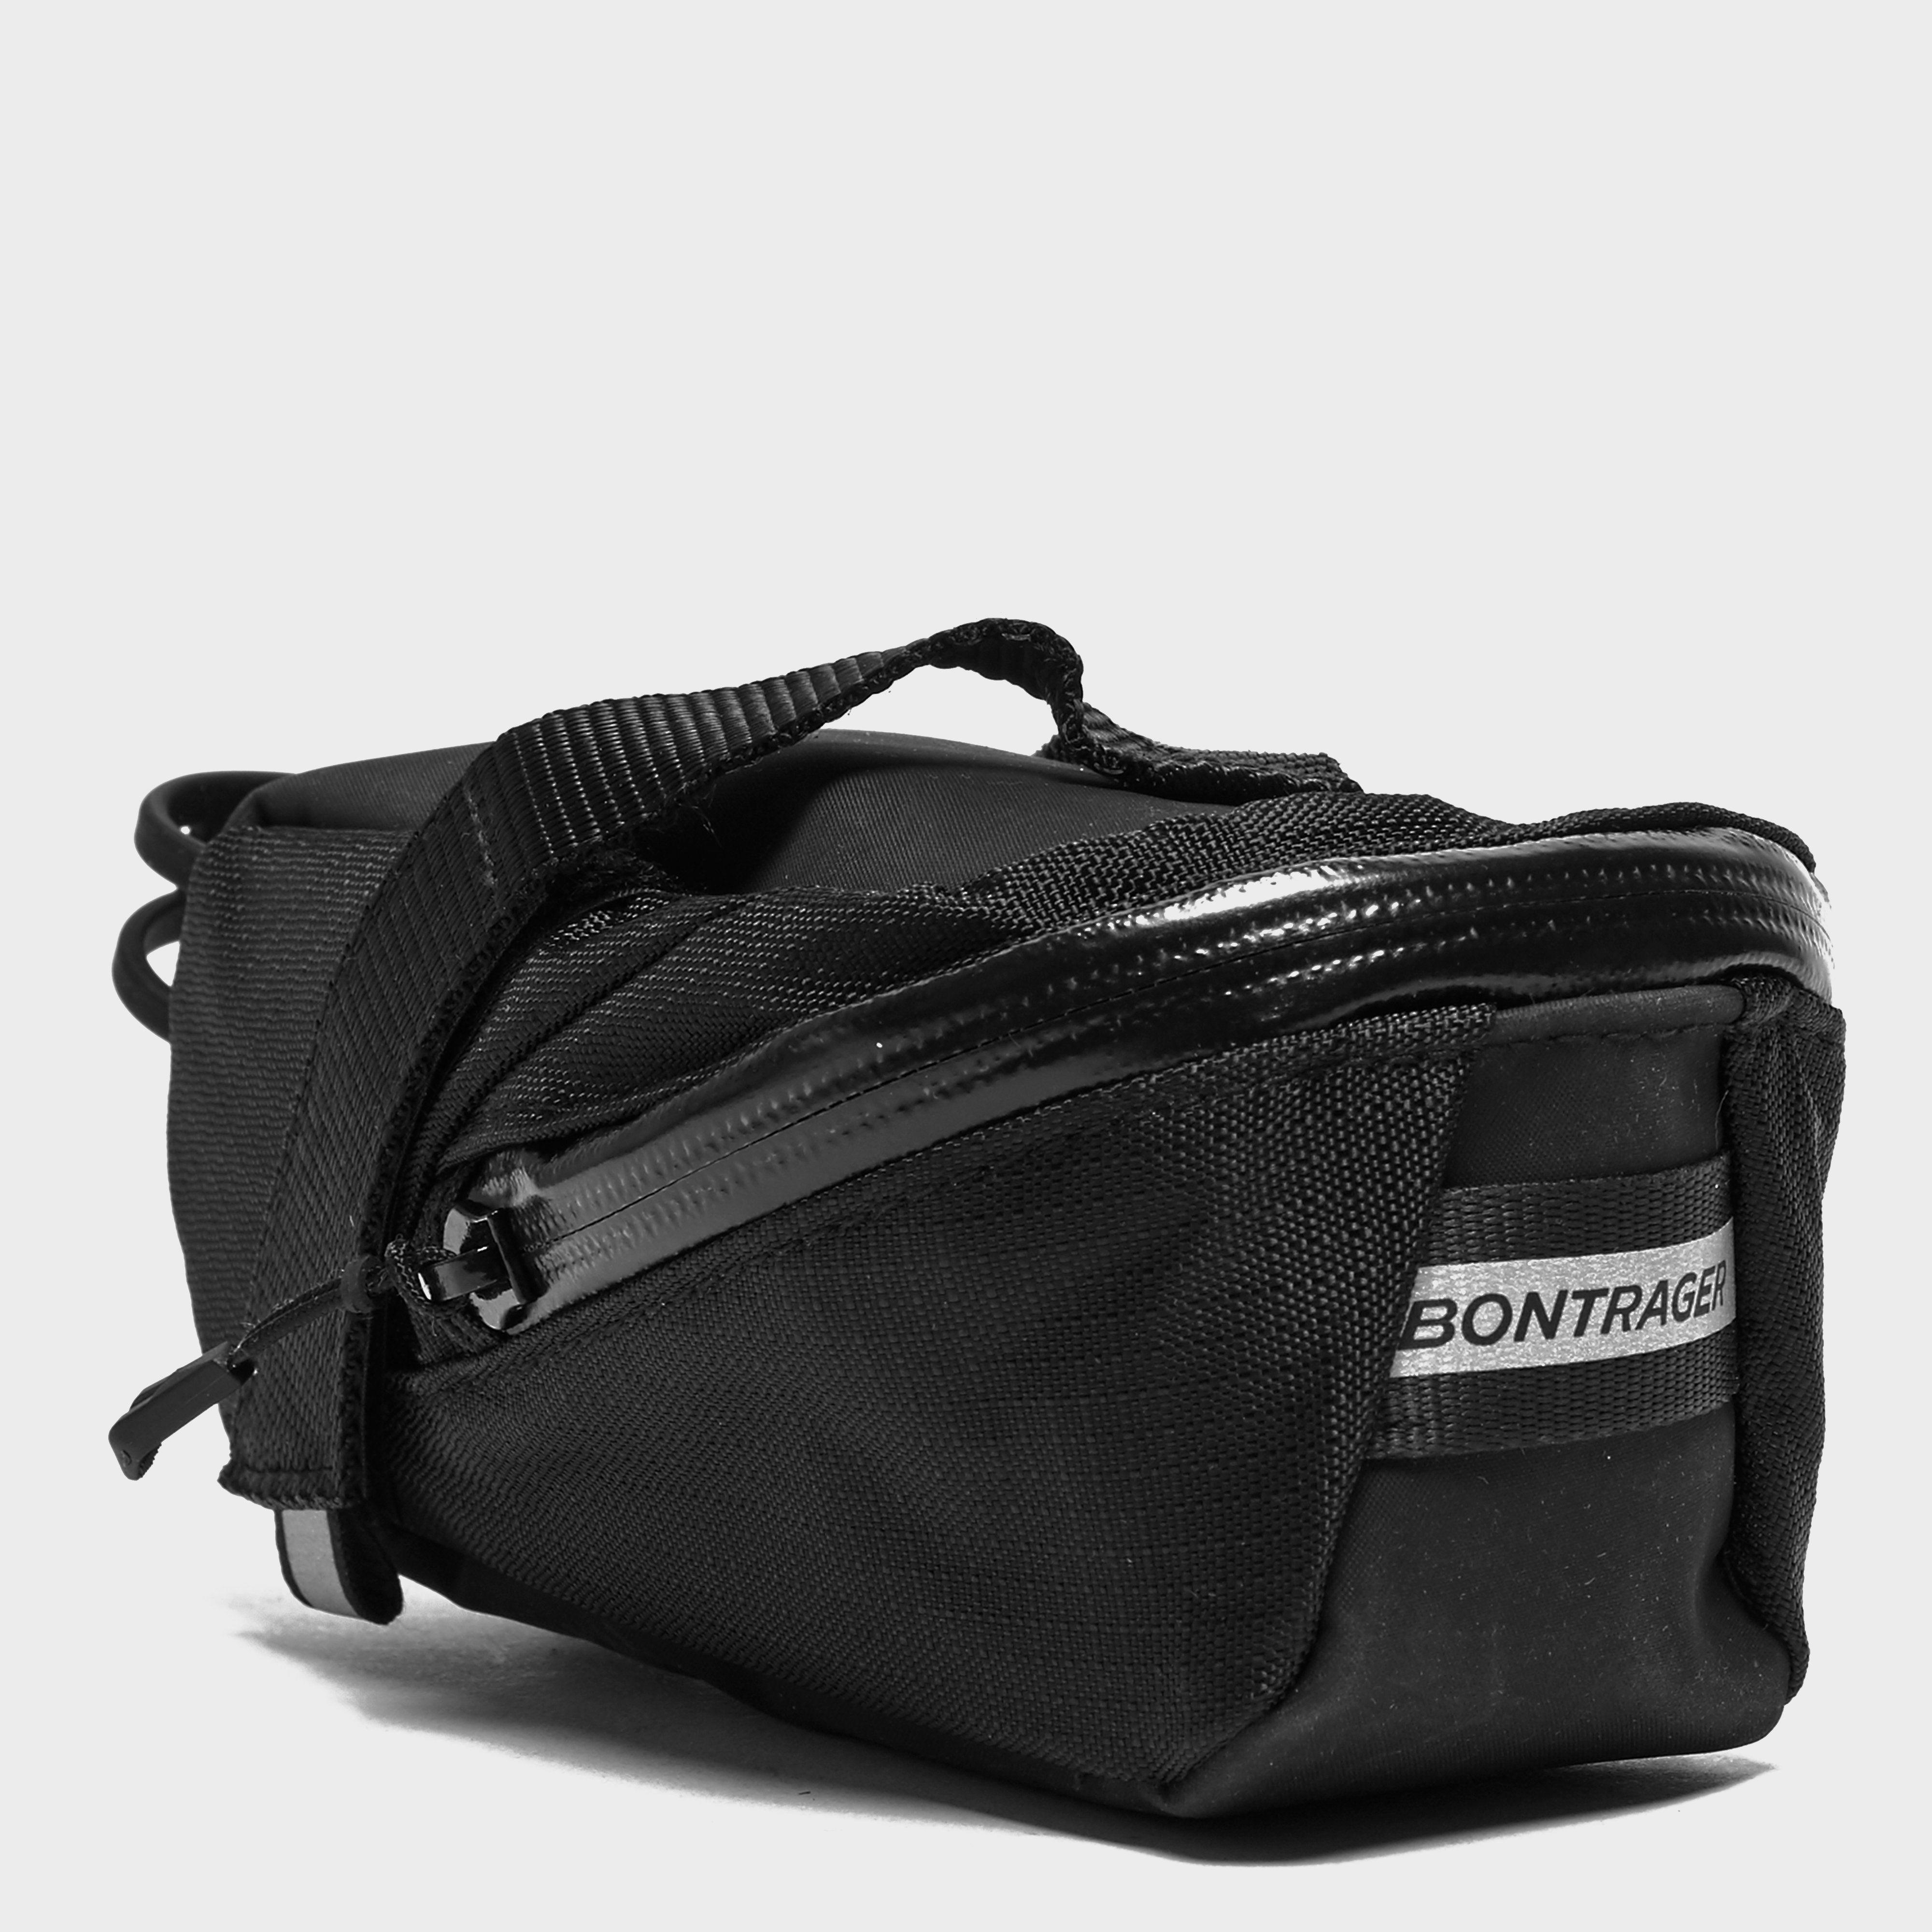 BONTRAGER Elite Seat Pack (Medium)